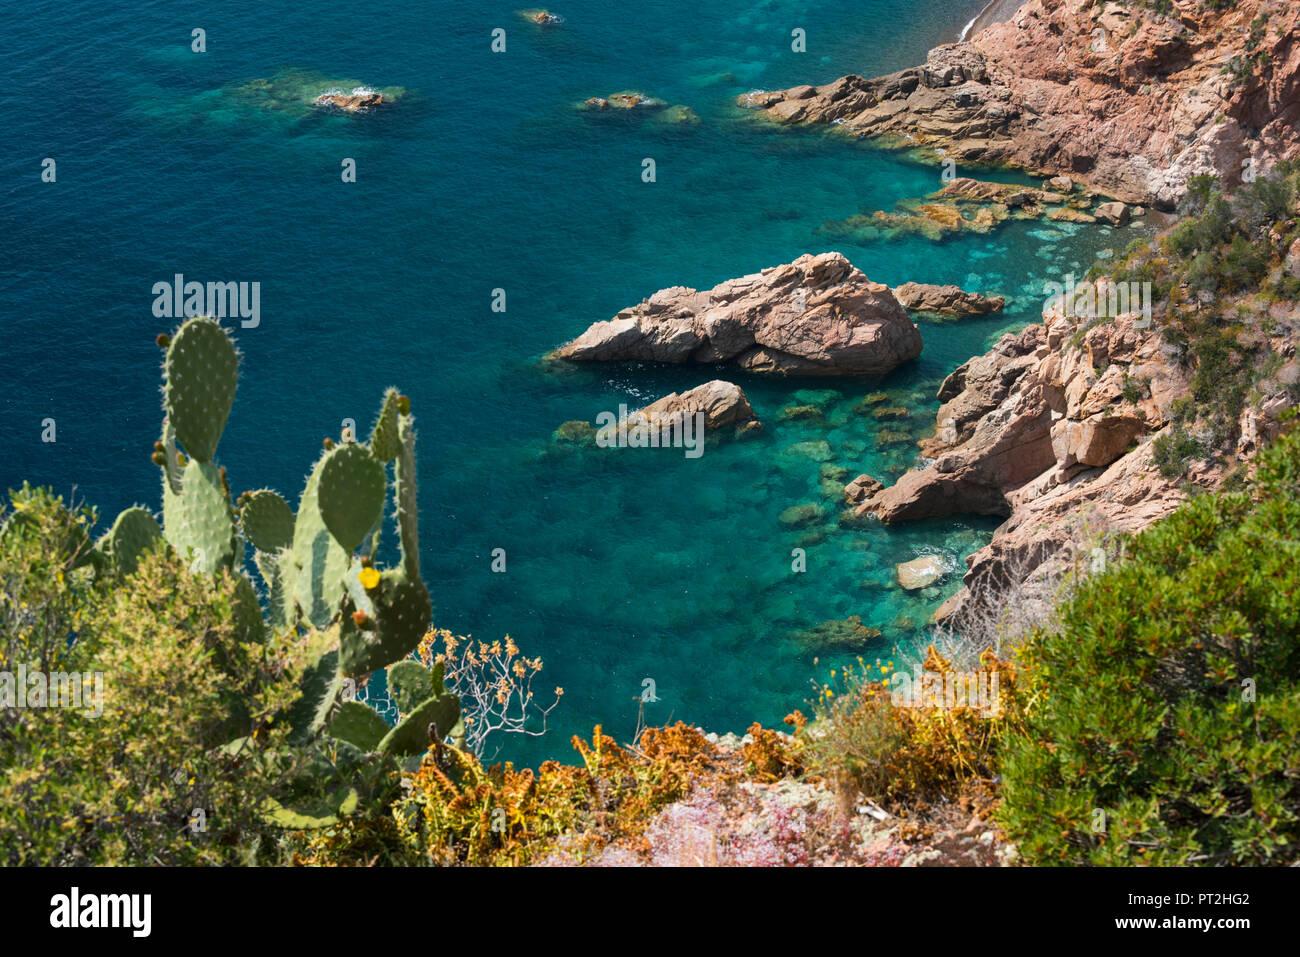 Küste von Bussaglia, Golfe di Porto, Korsika, Frankreich Stockbild